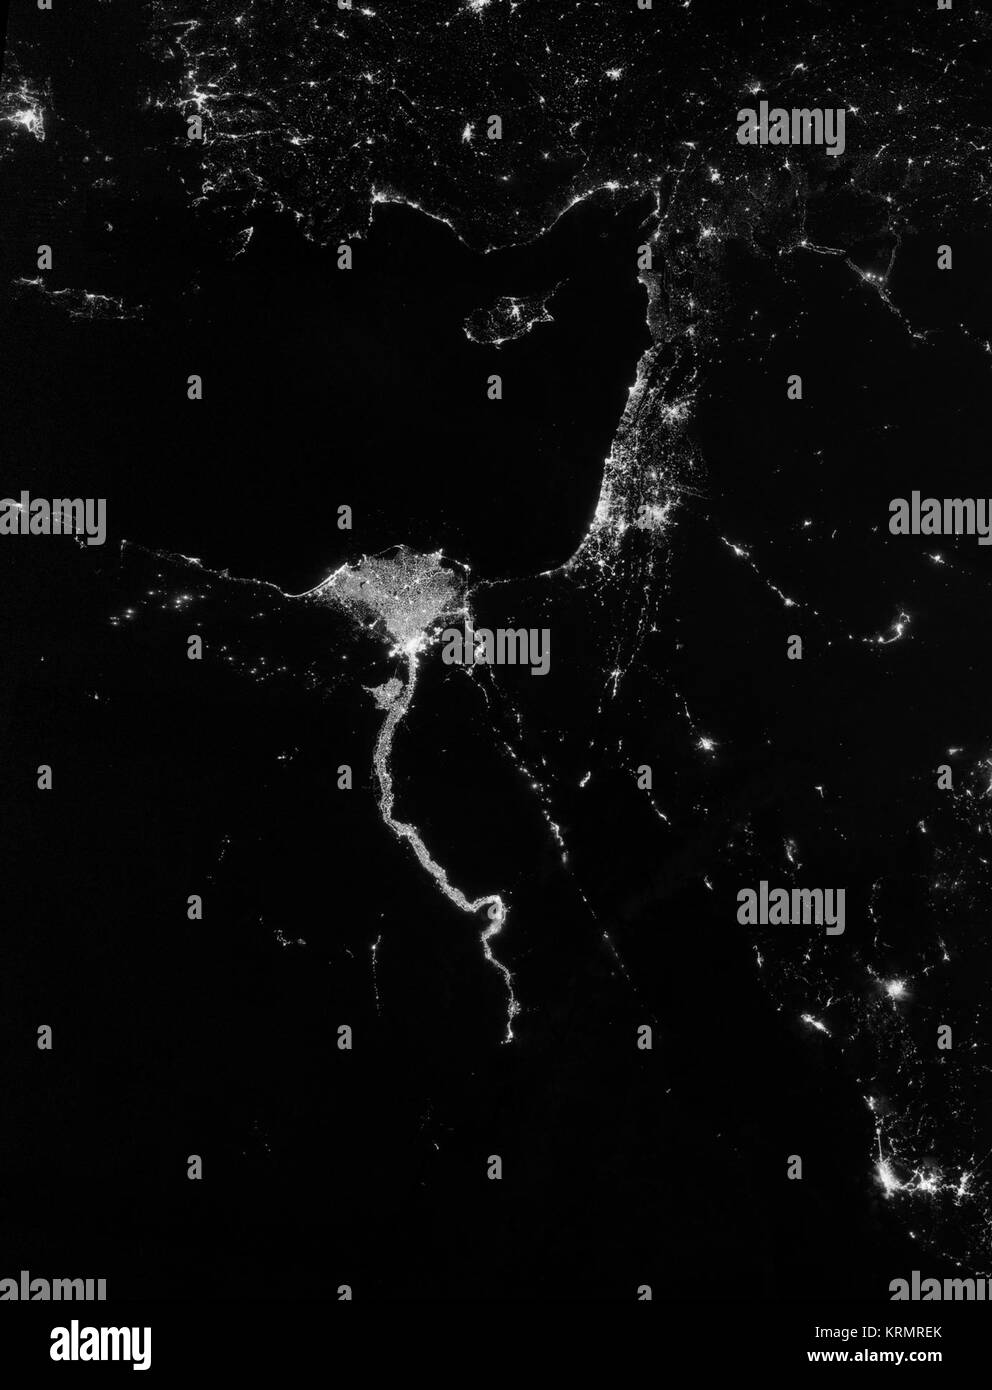 City Lights Illuminate the Nile (8246889227) - Stock Image